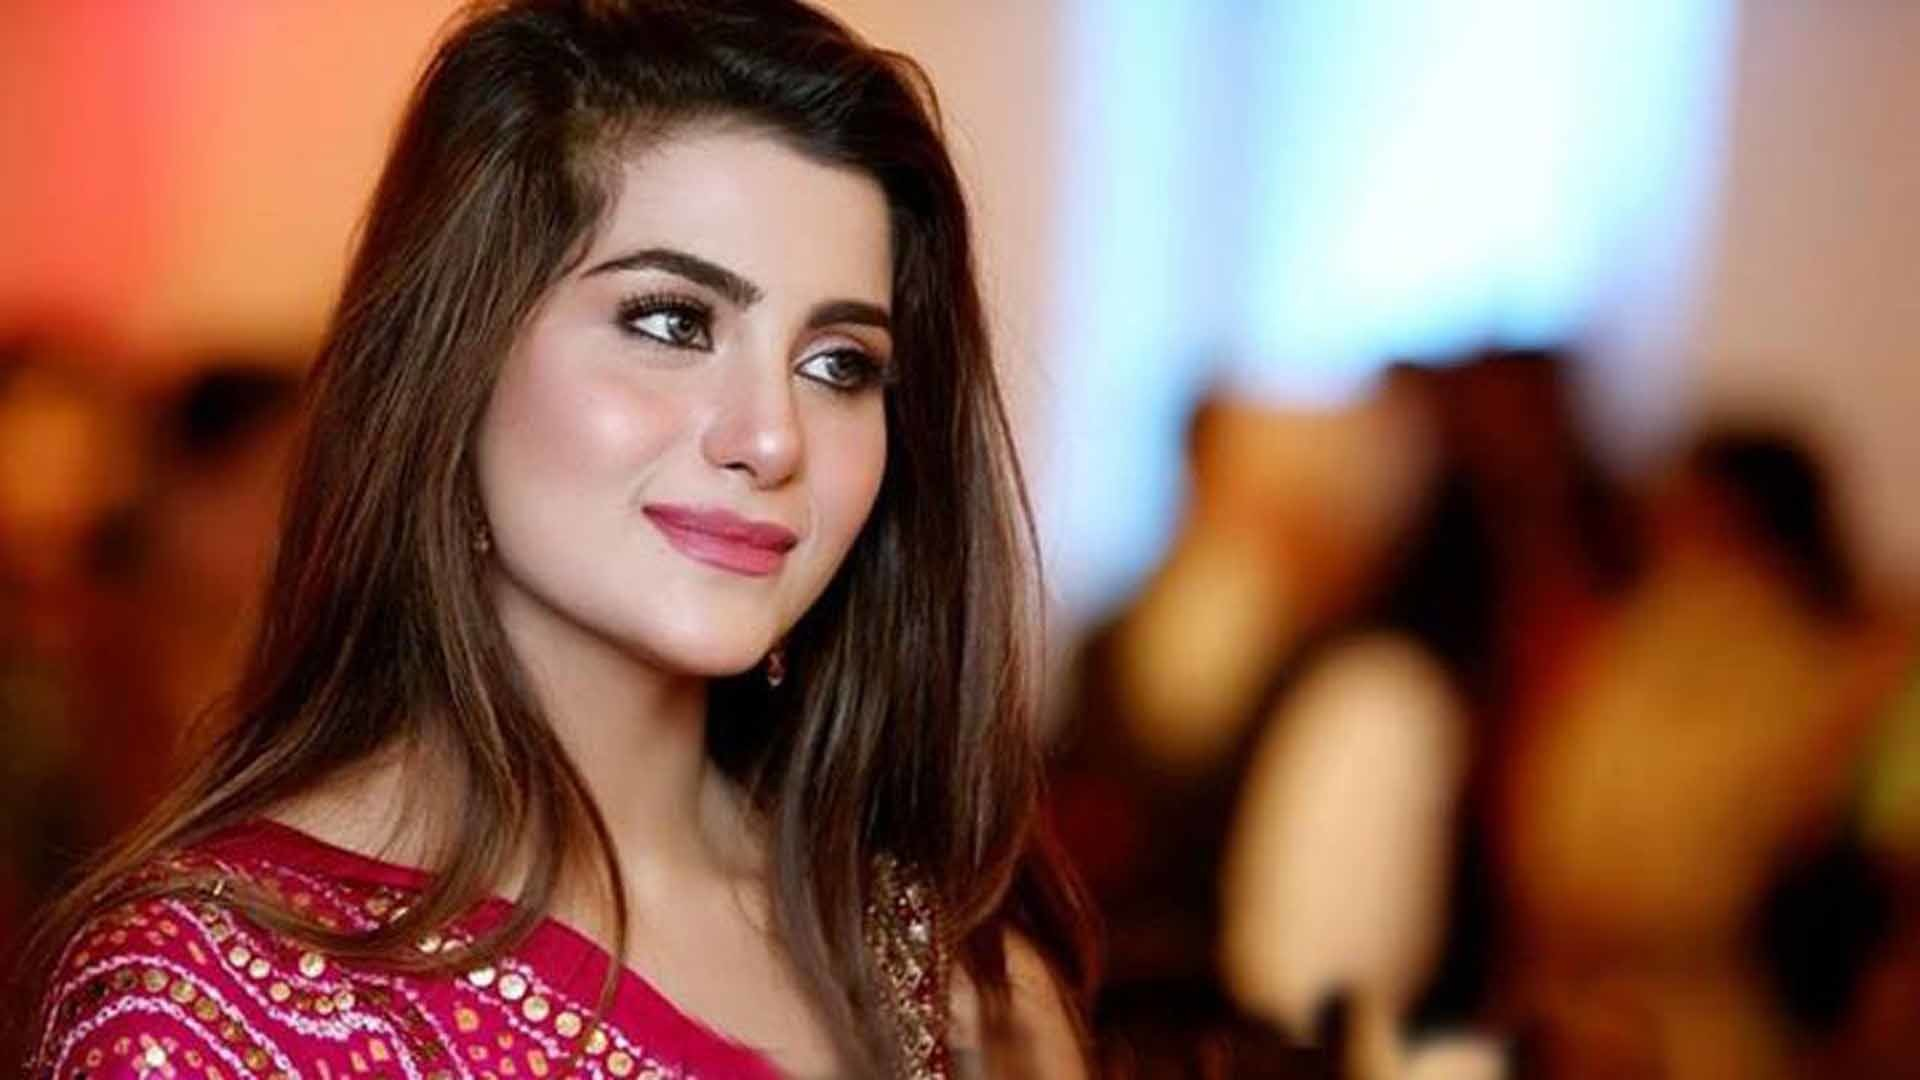 Beautiful Girl Hd Wallpaper Pakistani Girls 110936 Hd